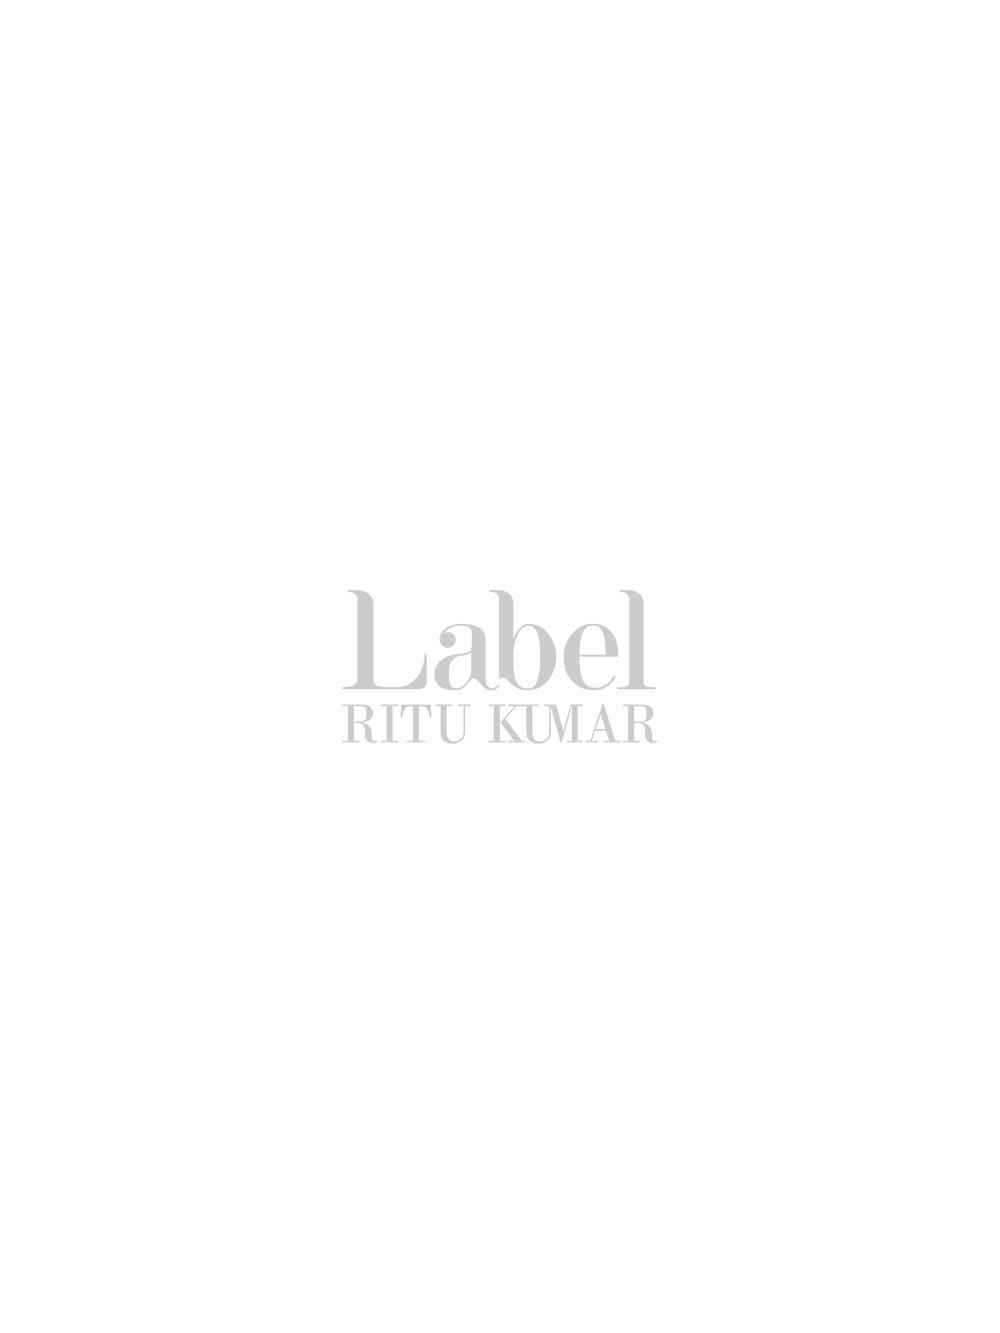 Indigo Full Sleeved Shirt in Signature Label Ritu Kumar Print